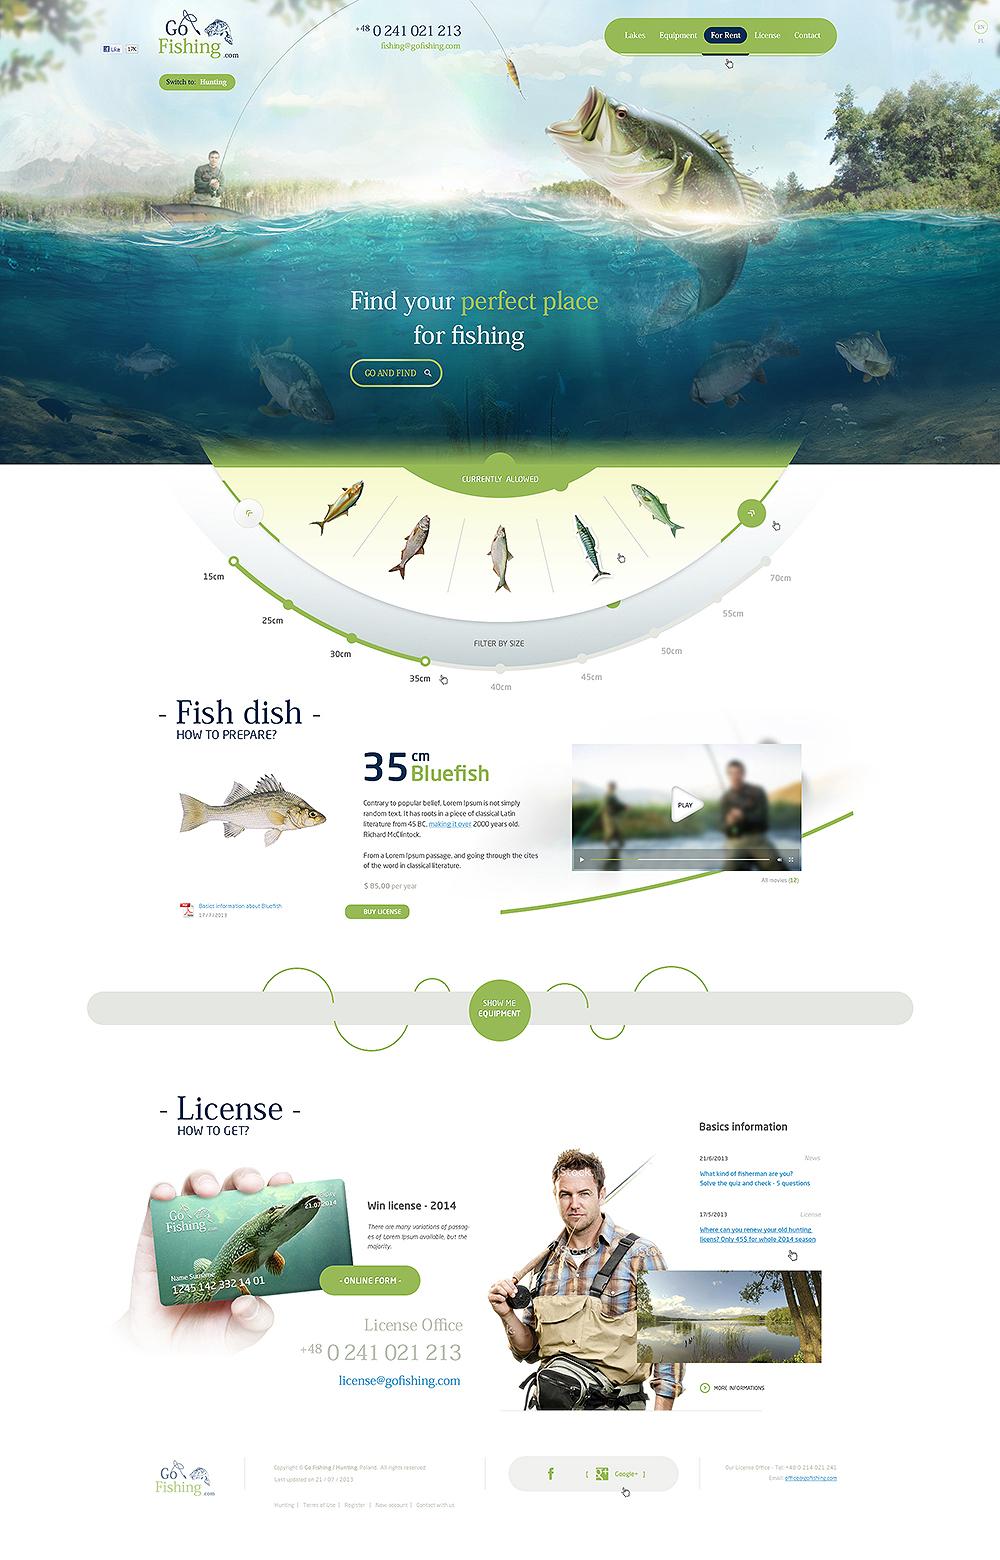 Gofishing gohunting east2go creative agency for Go go fishing